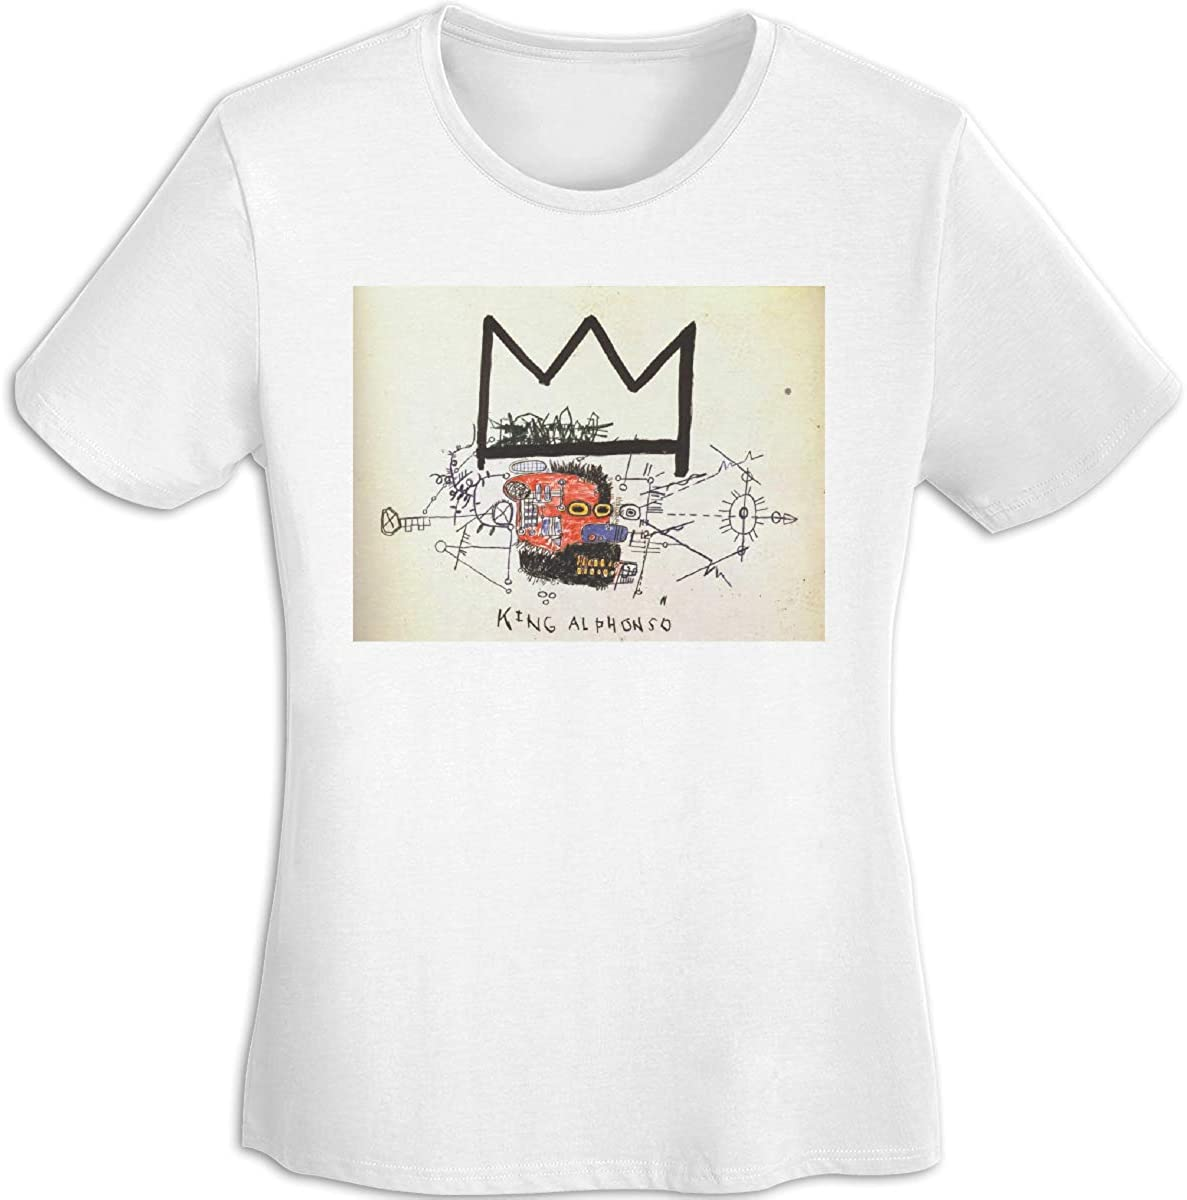 JIkLQmvtb Jean-Michel Basquiat Women Youth Girls Shirt Summer Casual T-Shirt Short Sleeve O Neck Shirts Tops